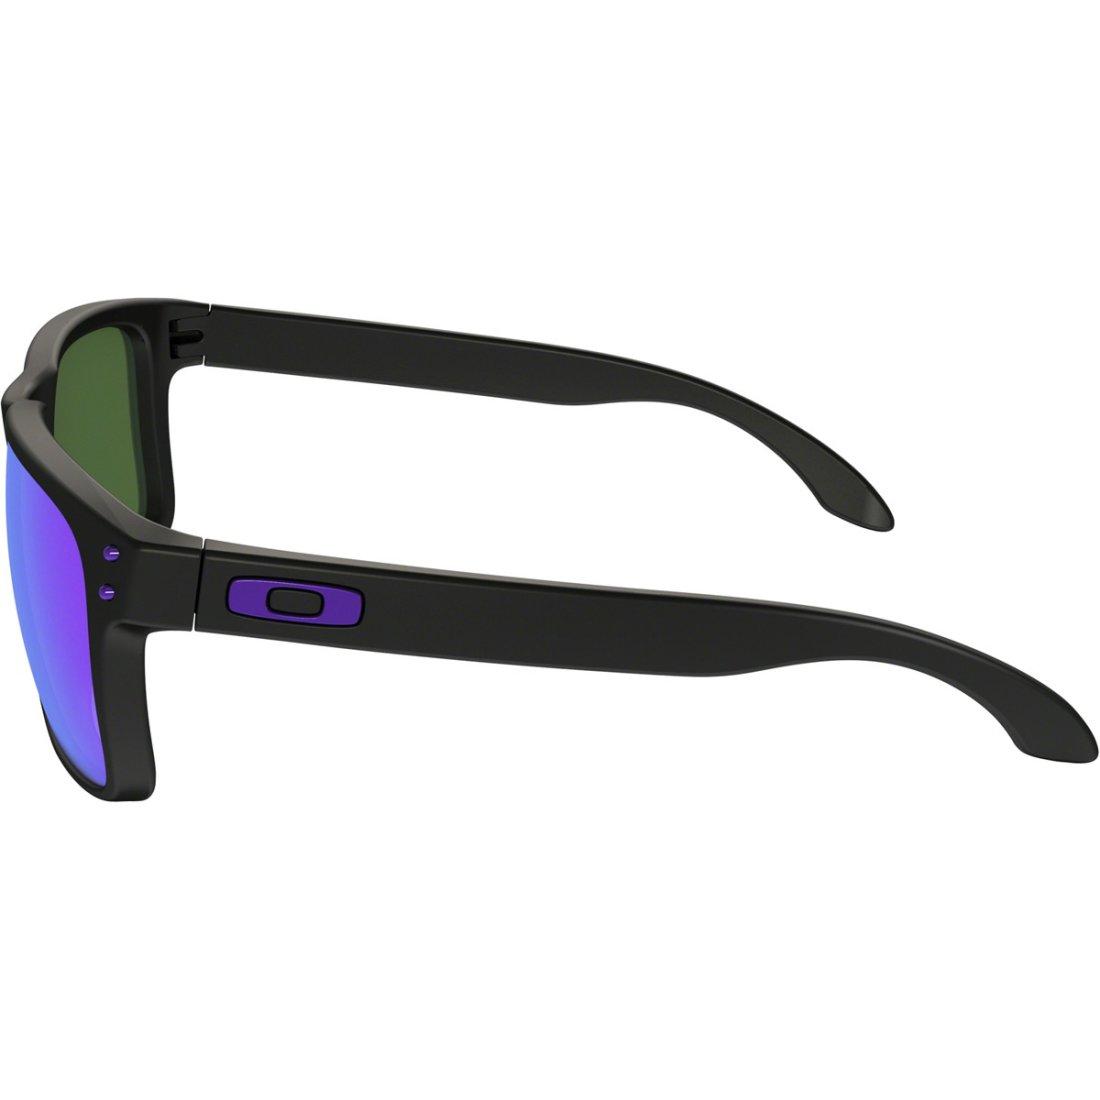 0546b16e6a OAKLEY Holbrook Julian Wilson Signature Series Matte Black   Violet Iridium  Sun glasses